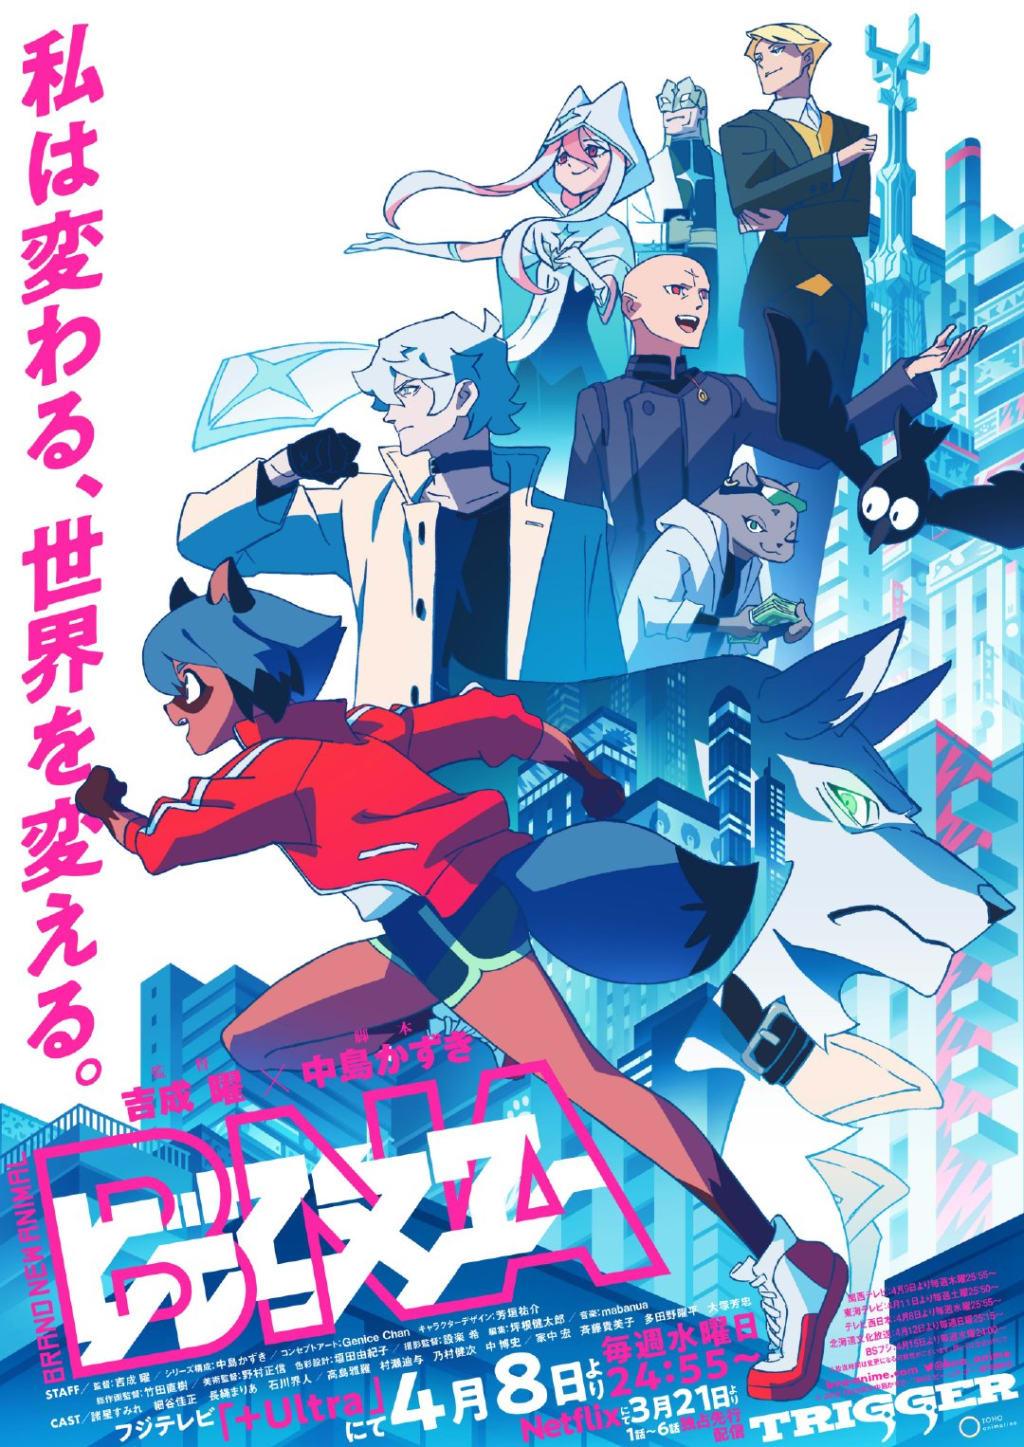 Anime to Watch: BNA: Brand New Animal